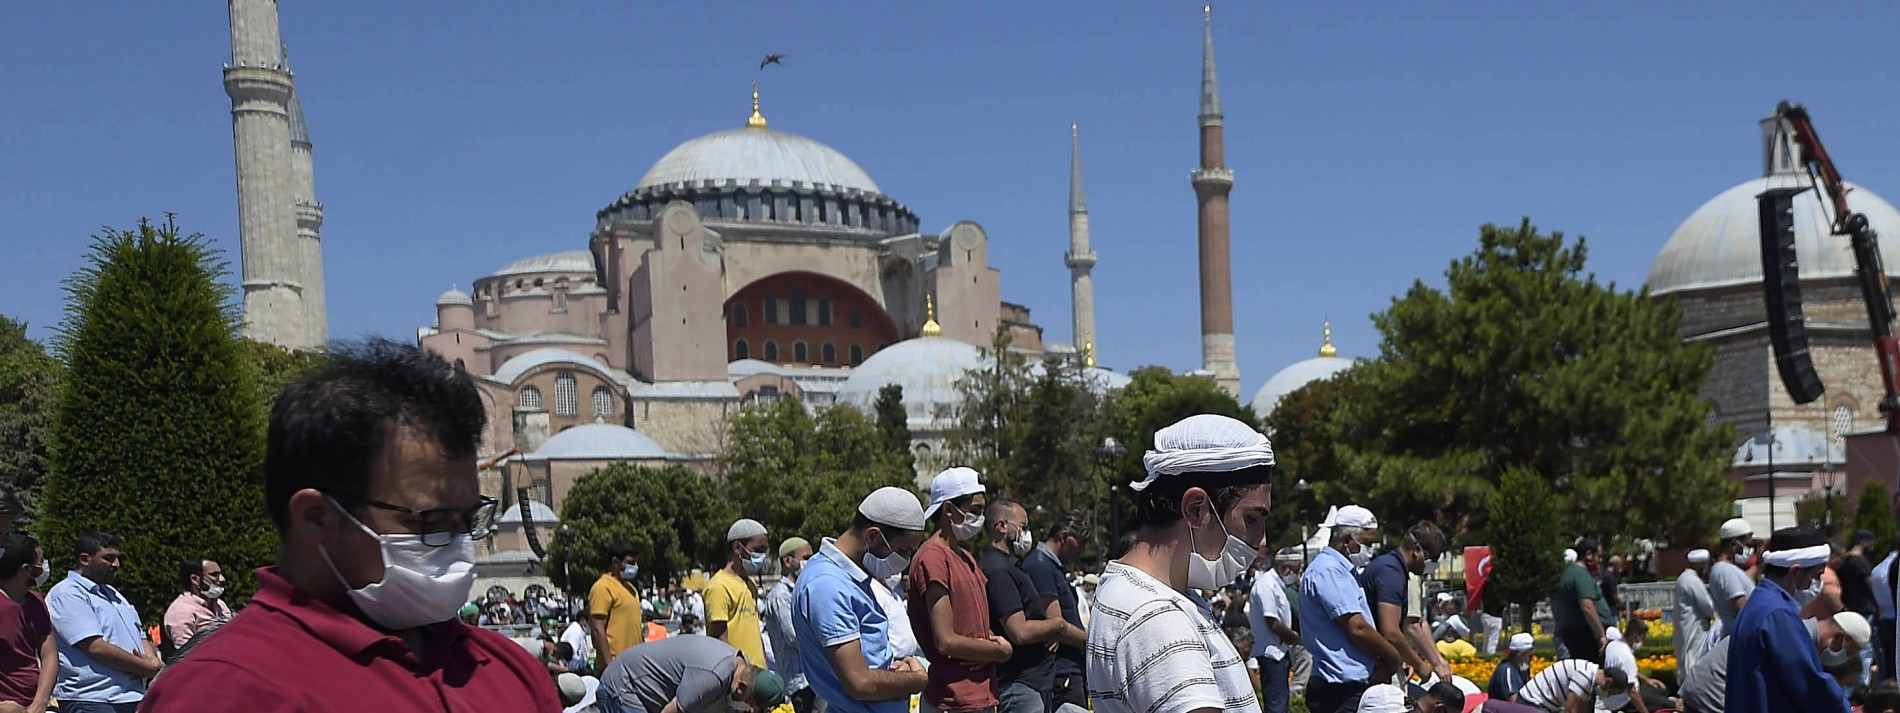 Erstmals wieder Freitagsgebet in Hagia Sophia